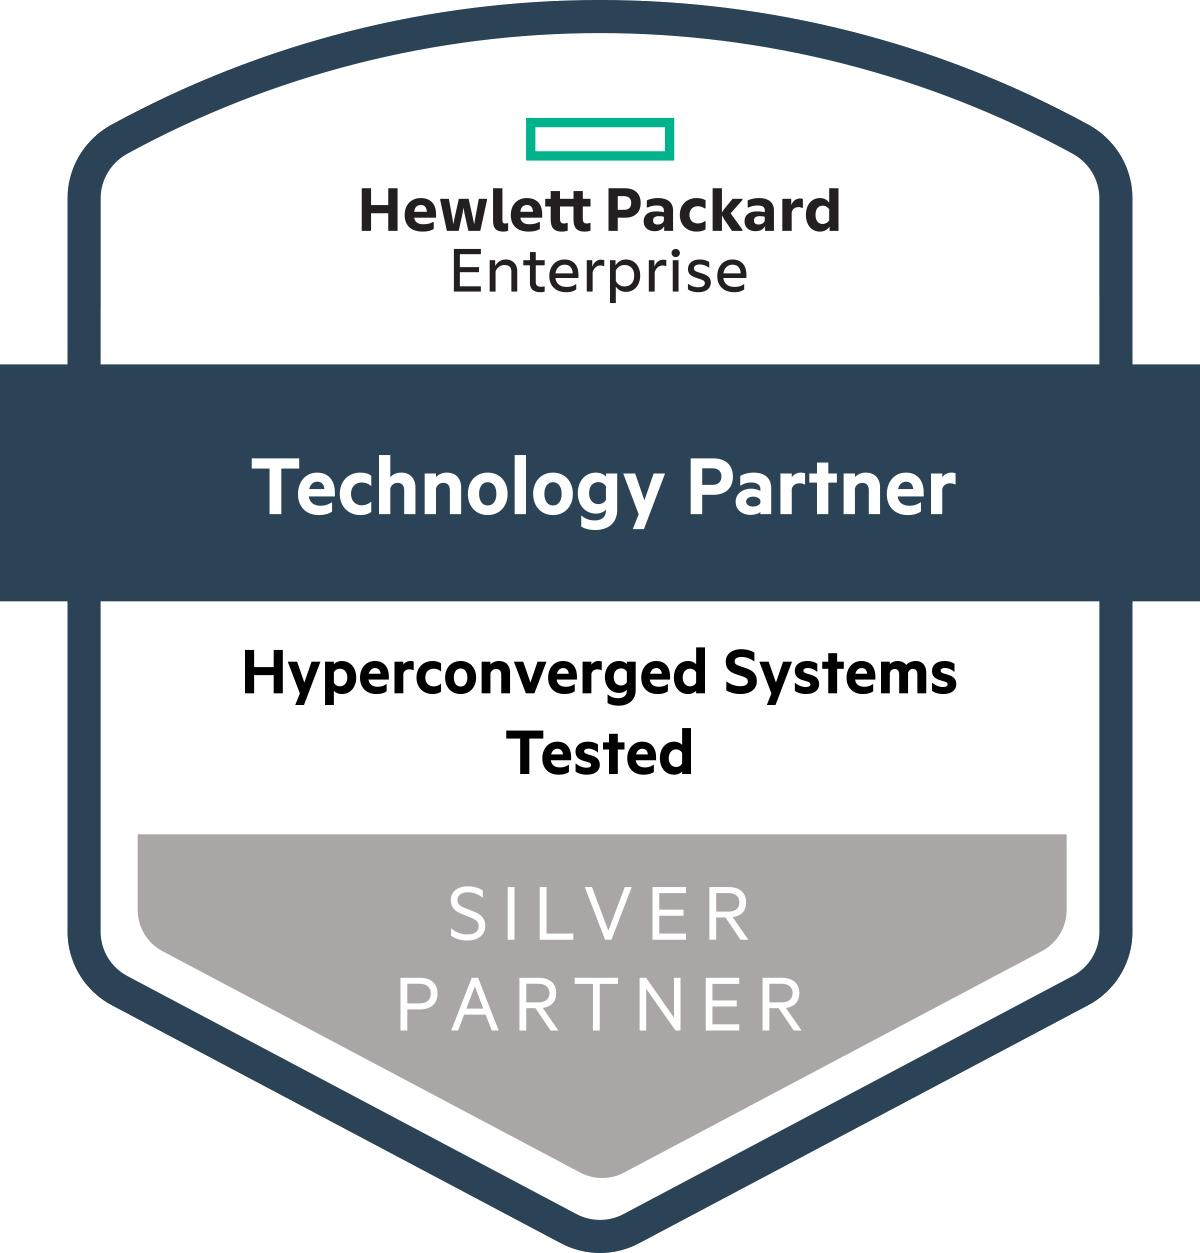 HPE Silver Partner badge